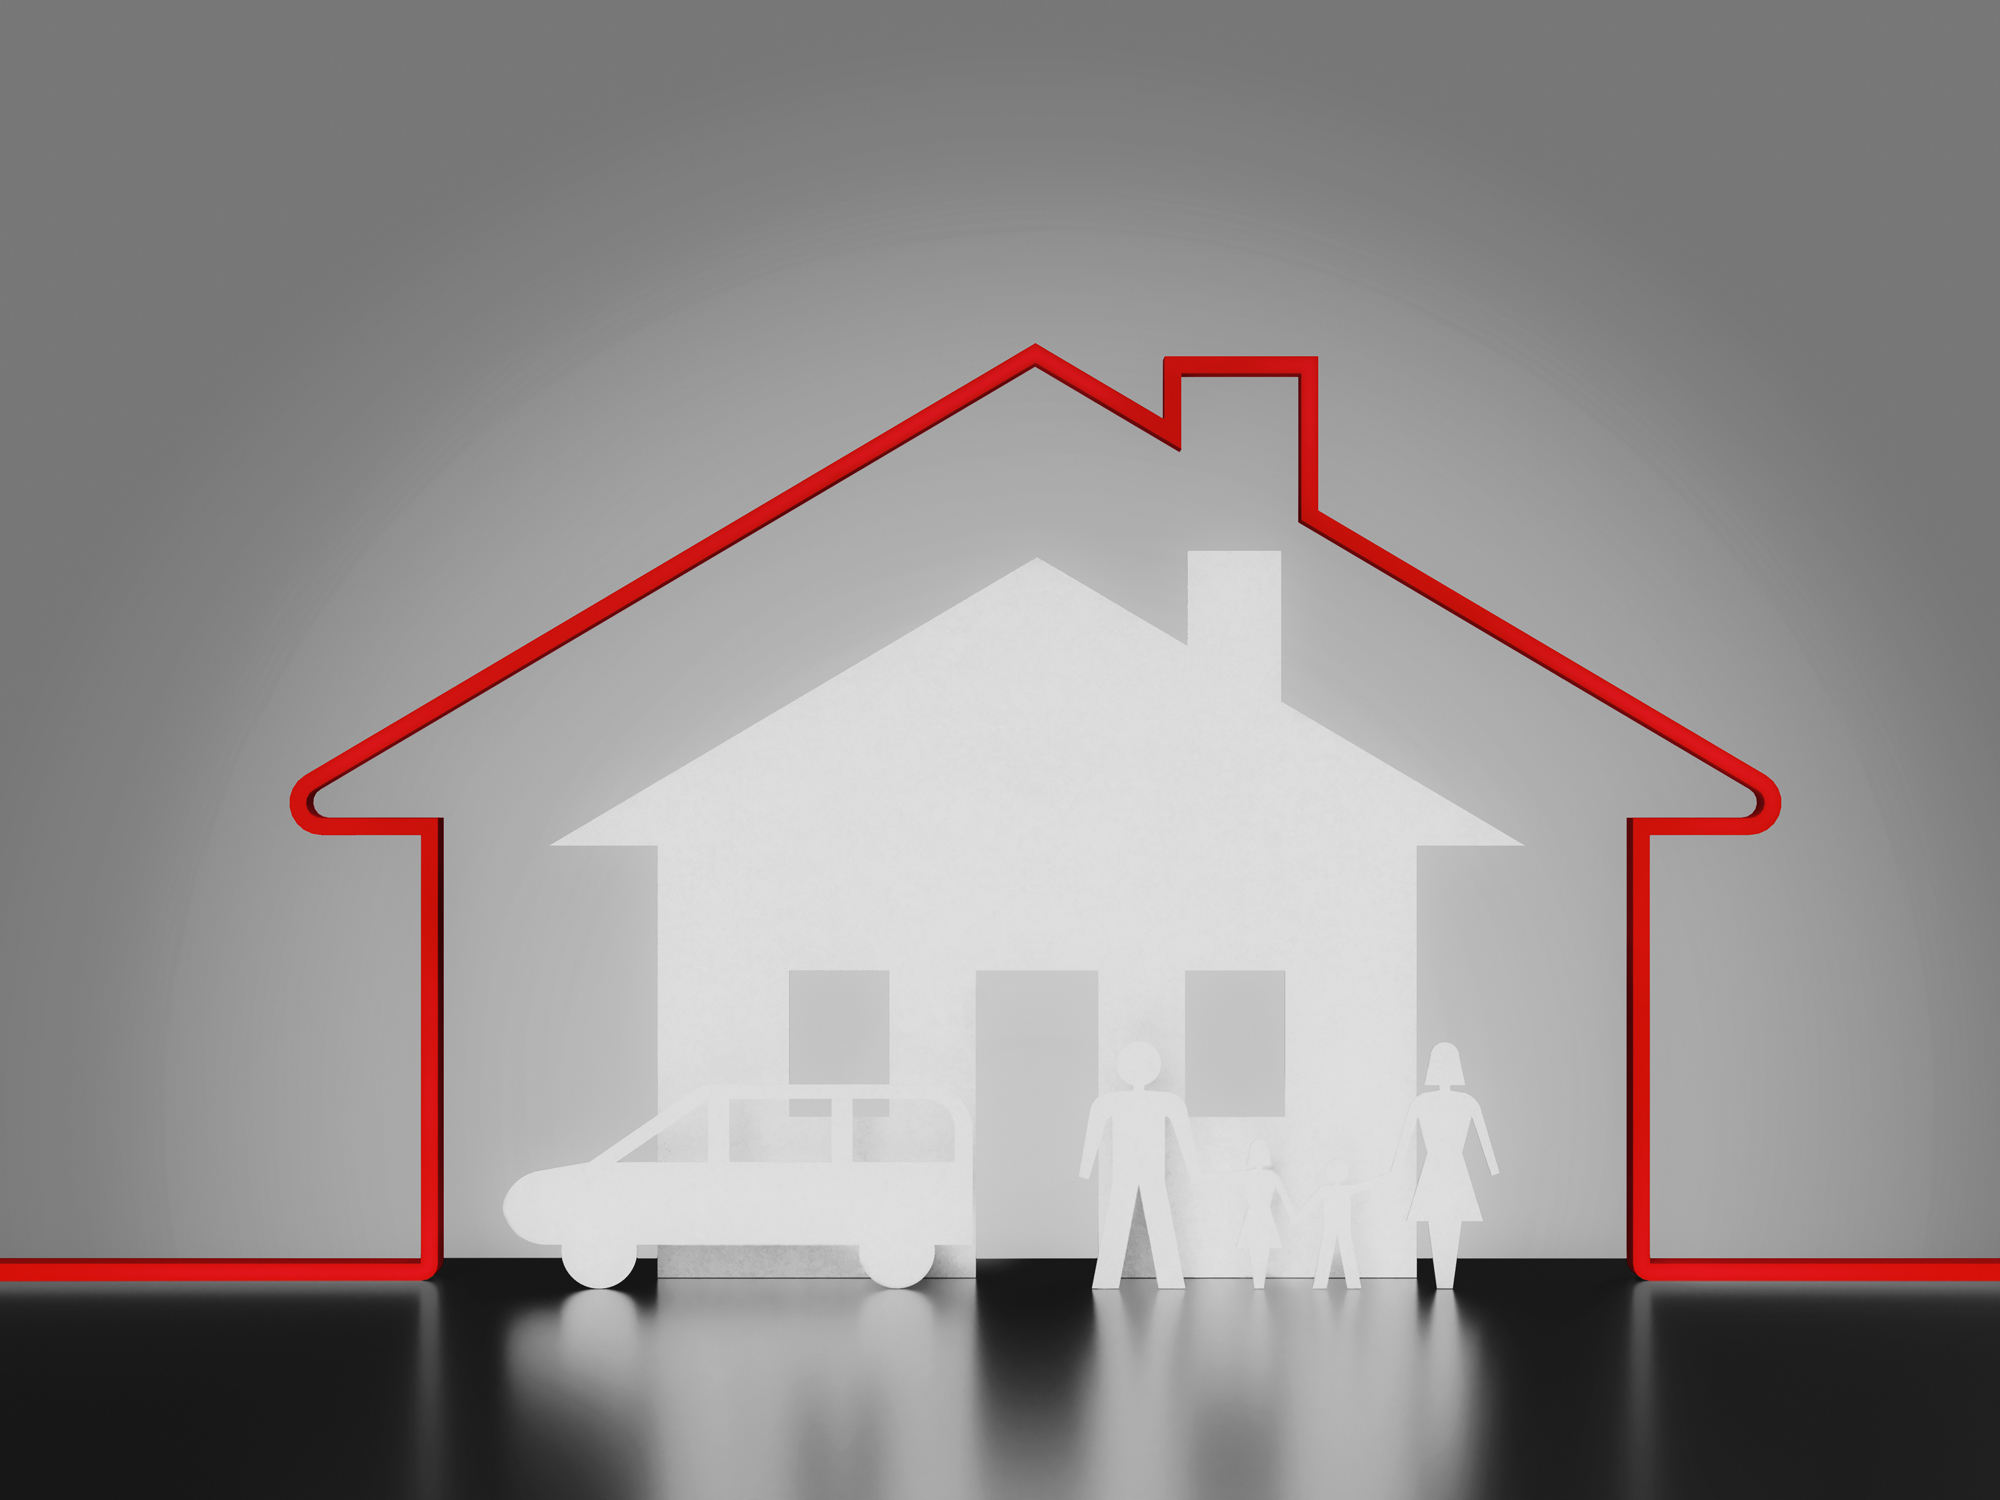 Kimiko-Zoellner AAA Insurance Agency - home insurance image - cover